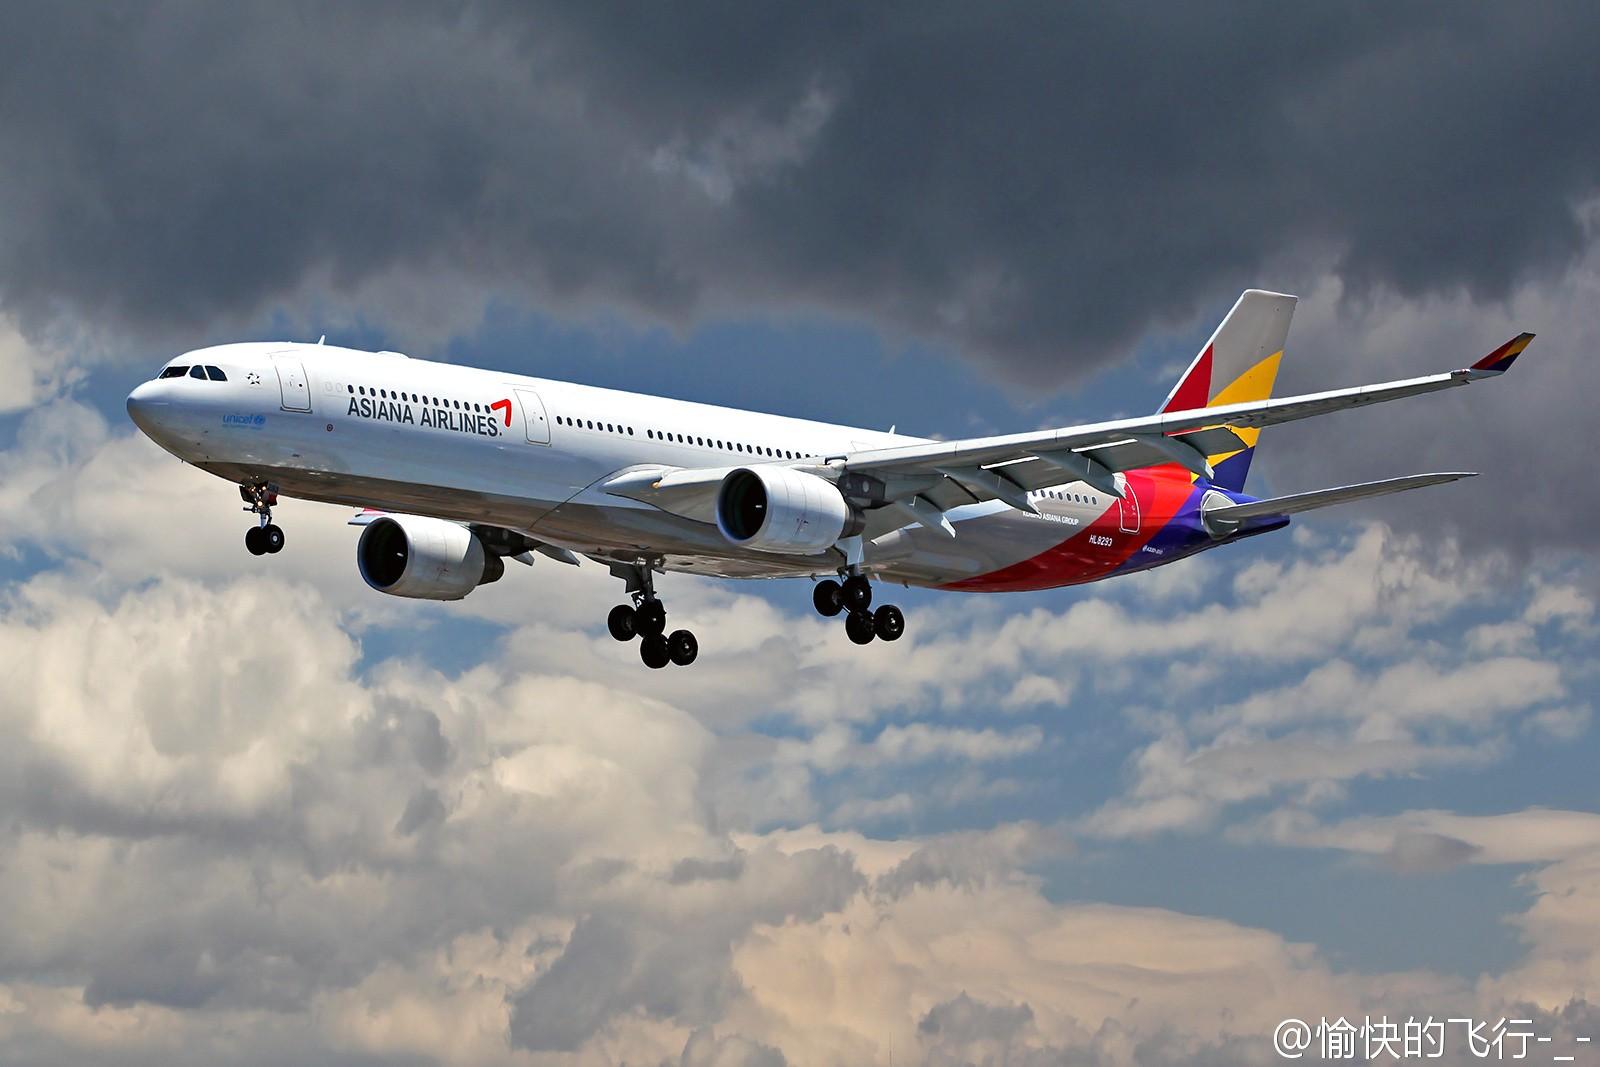 Re:[原创]。。。飞机美不美主要看背景。。。 AIRBUS A330-300 HL8293